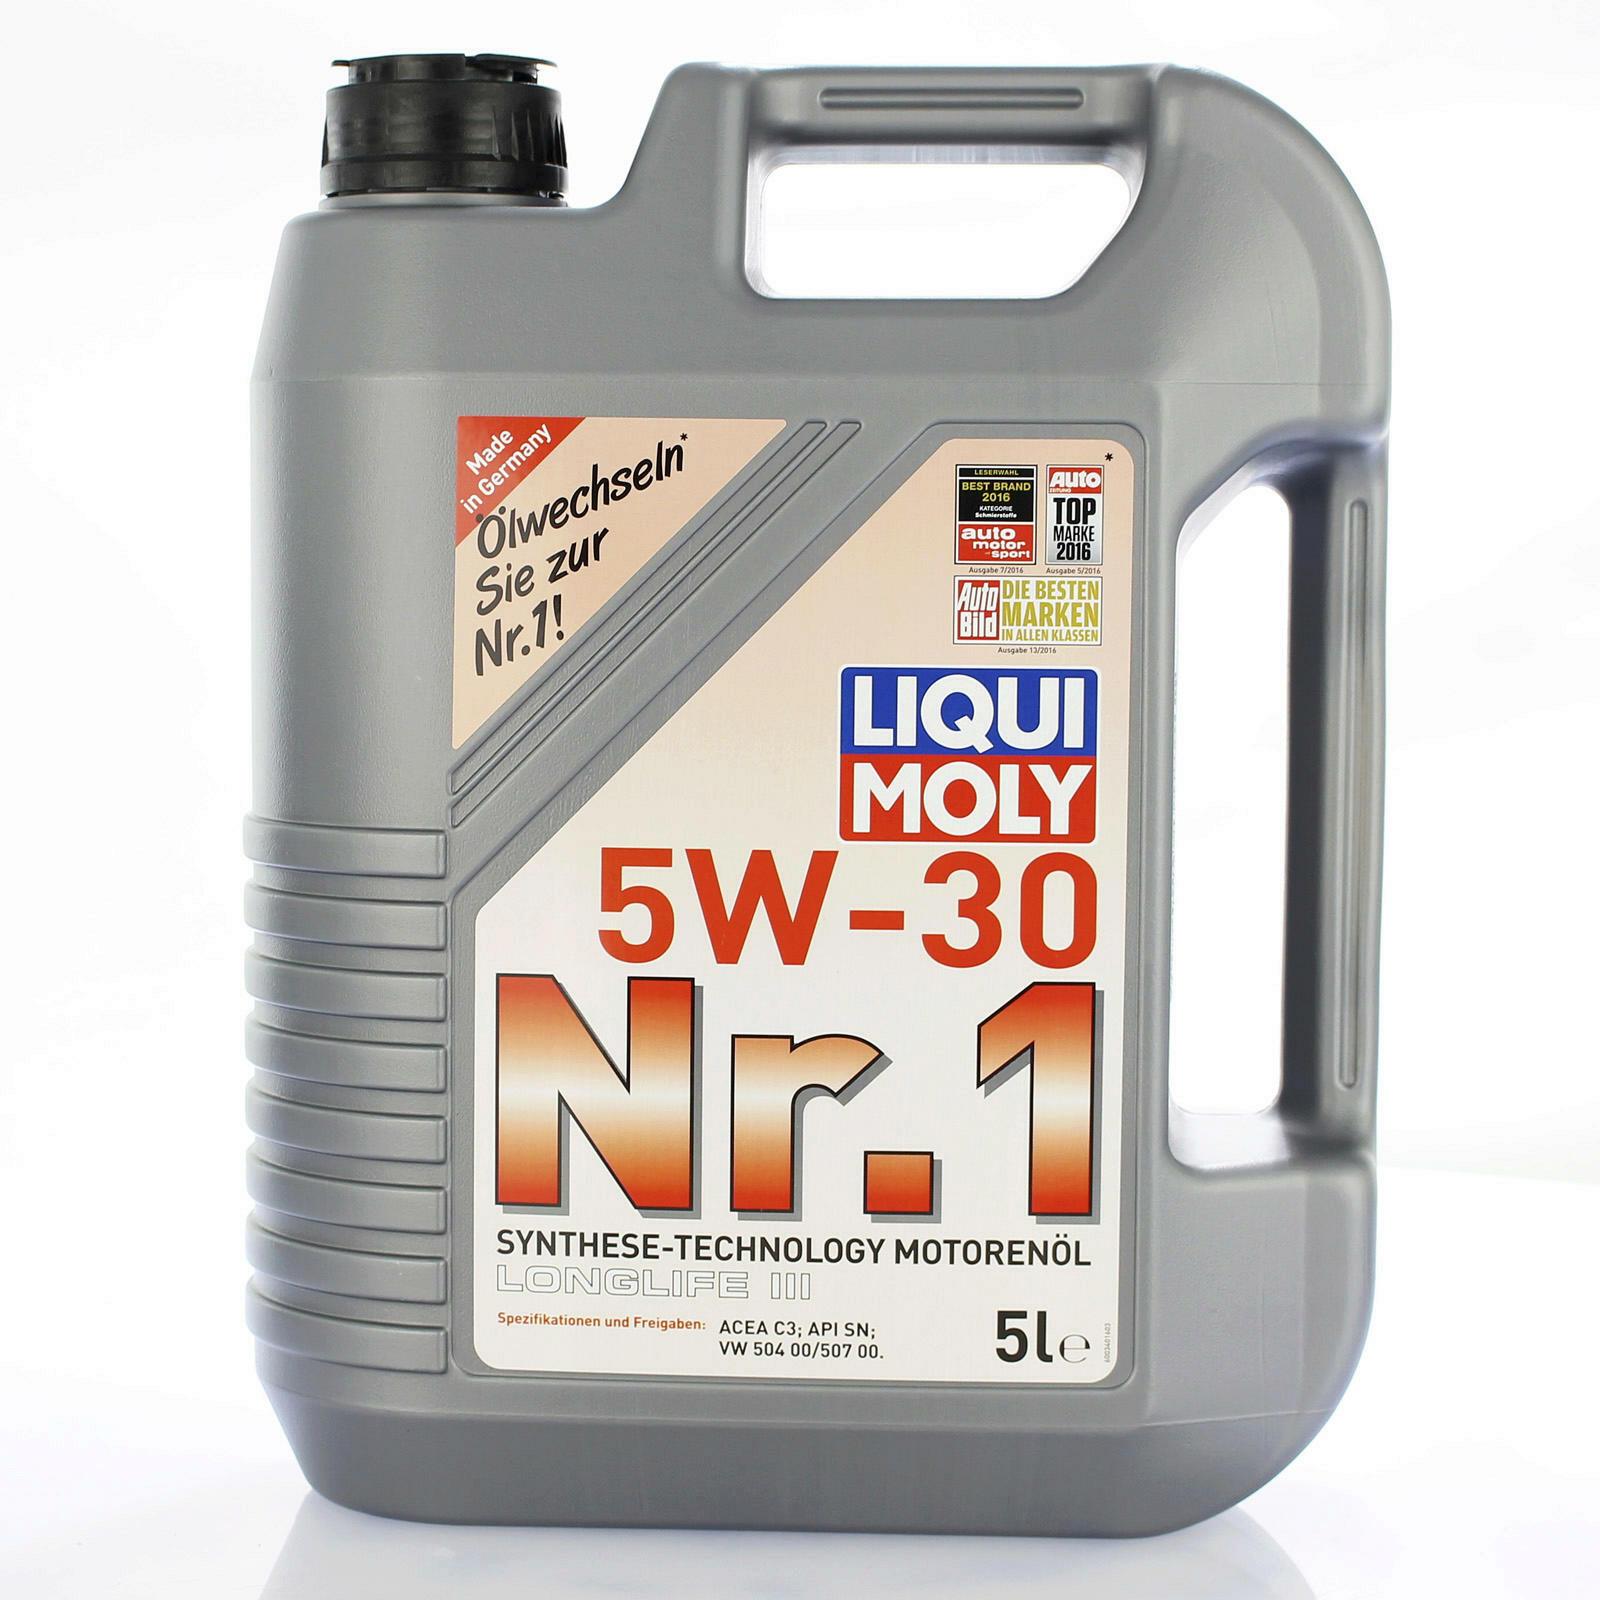 Liqui Moly Nr.1 Motorenöl 5W-30 5 Liter (507.00)